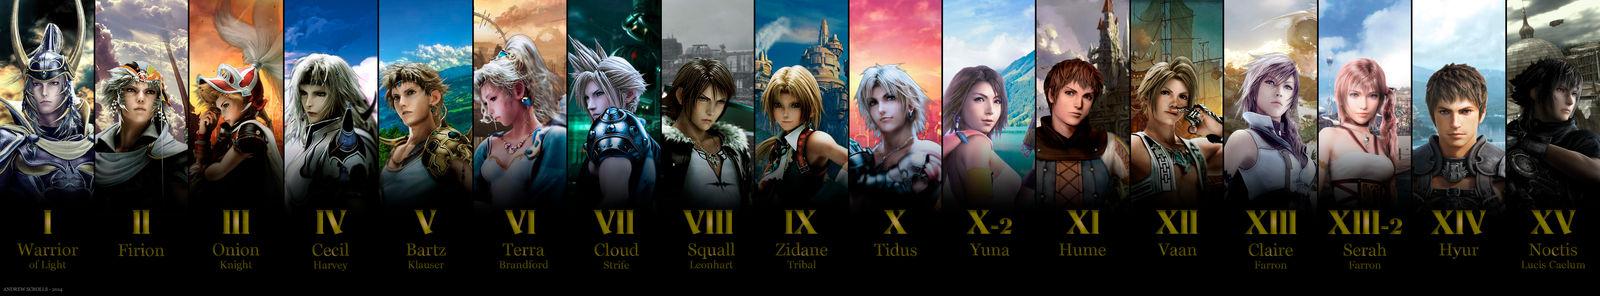 All Main Final Fantasy Games (I to XV)